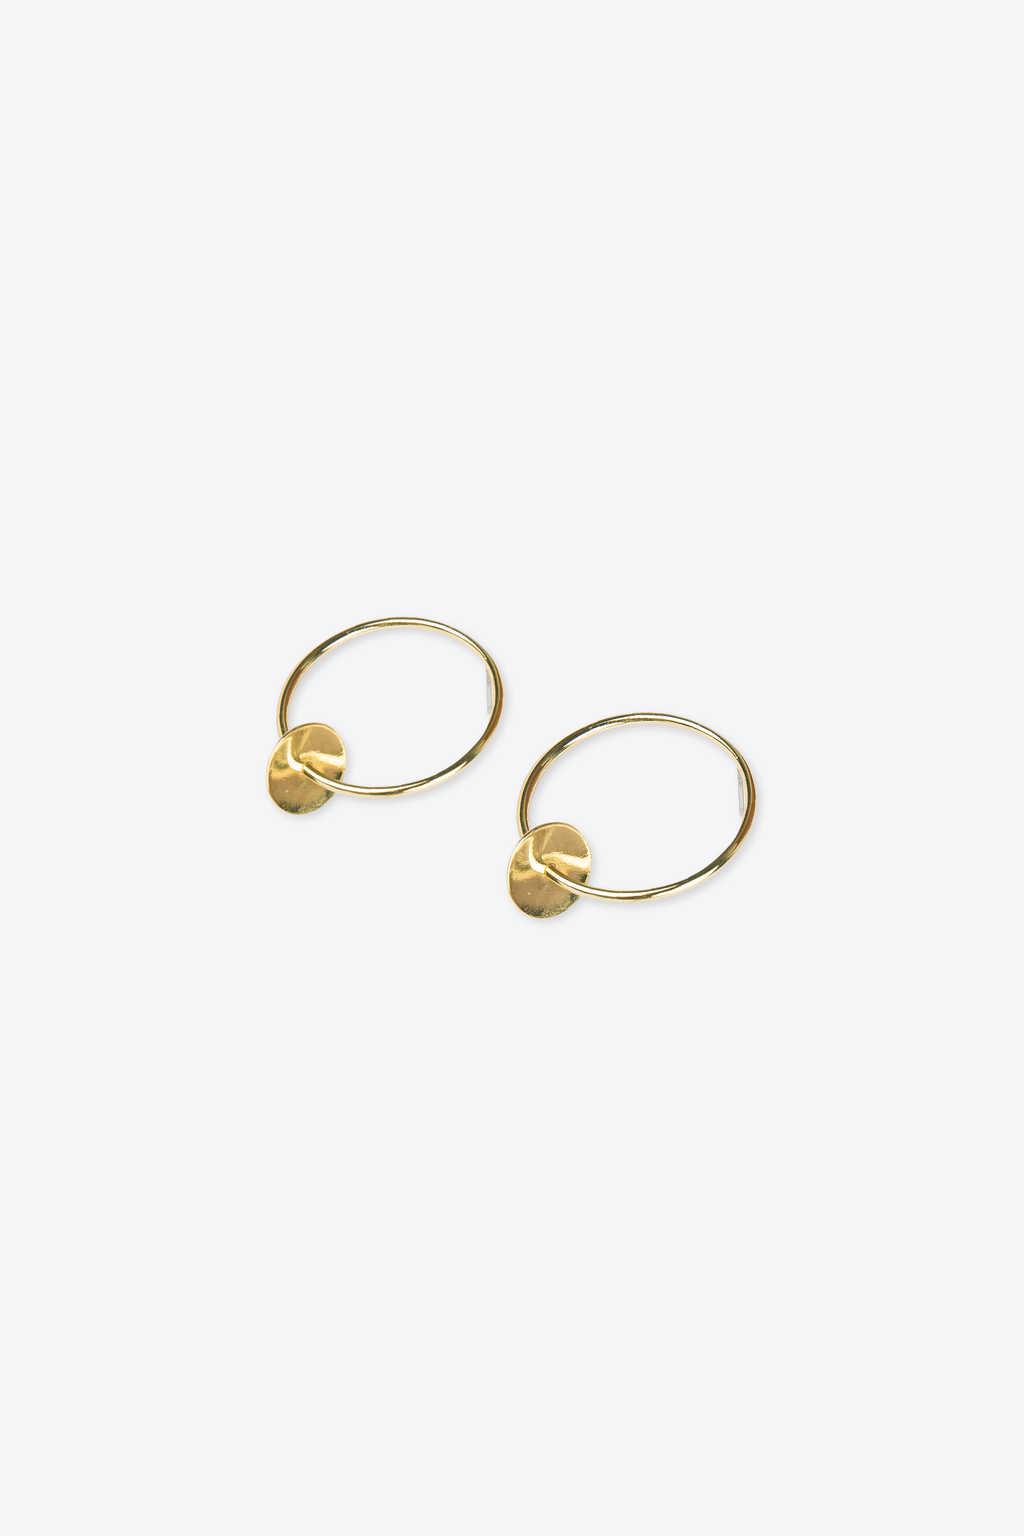 Earring 2433 Gold 4